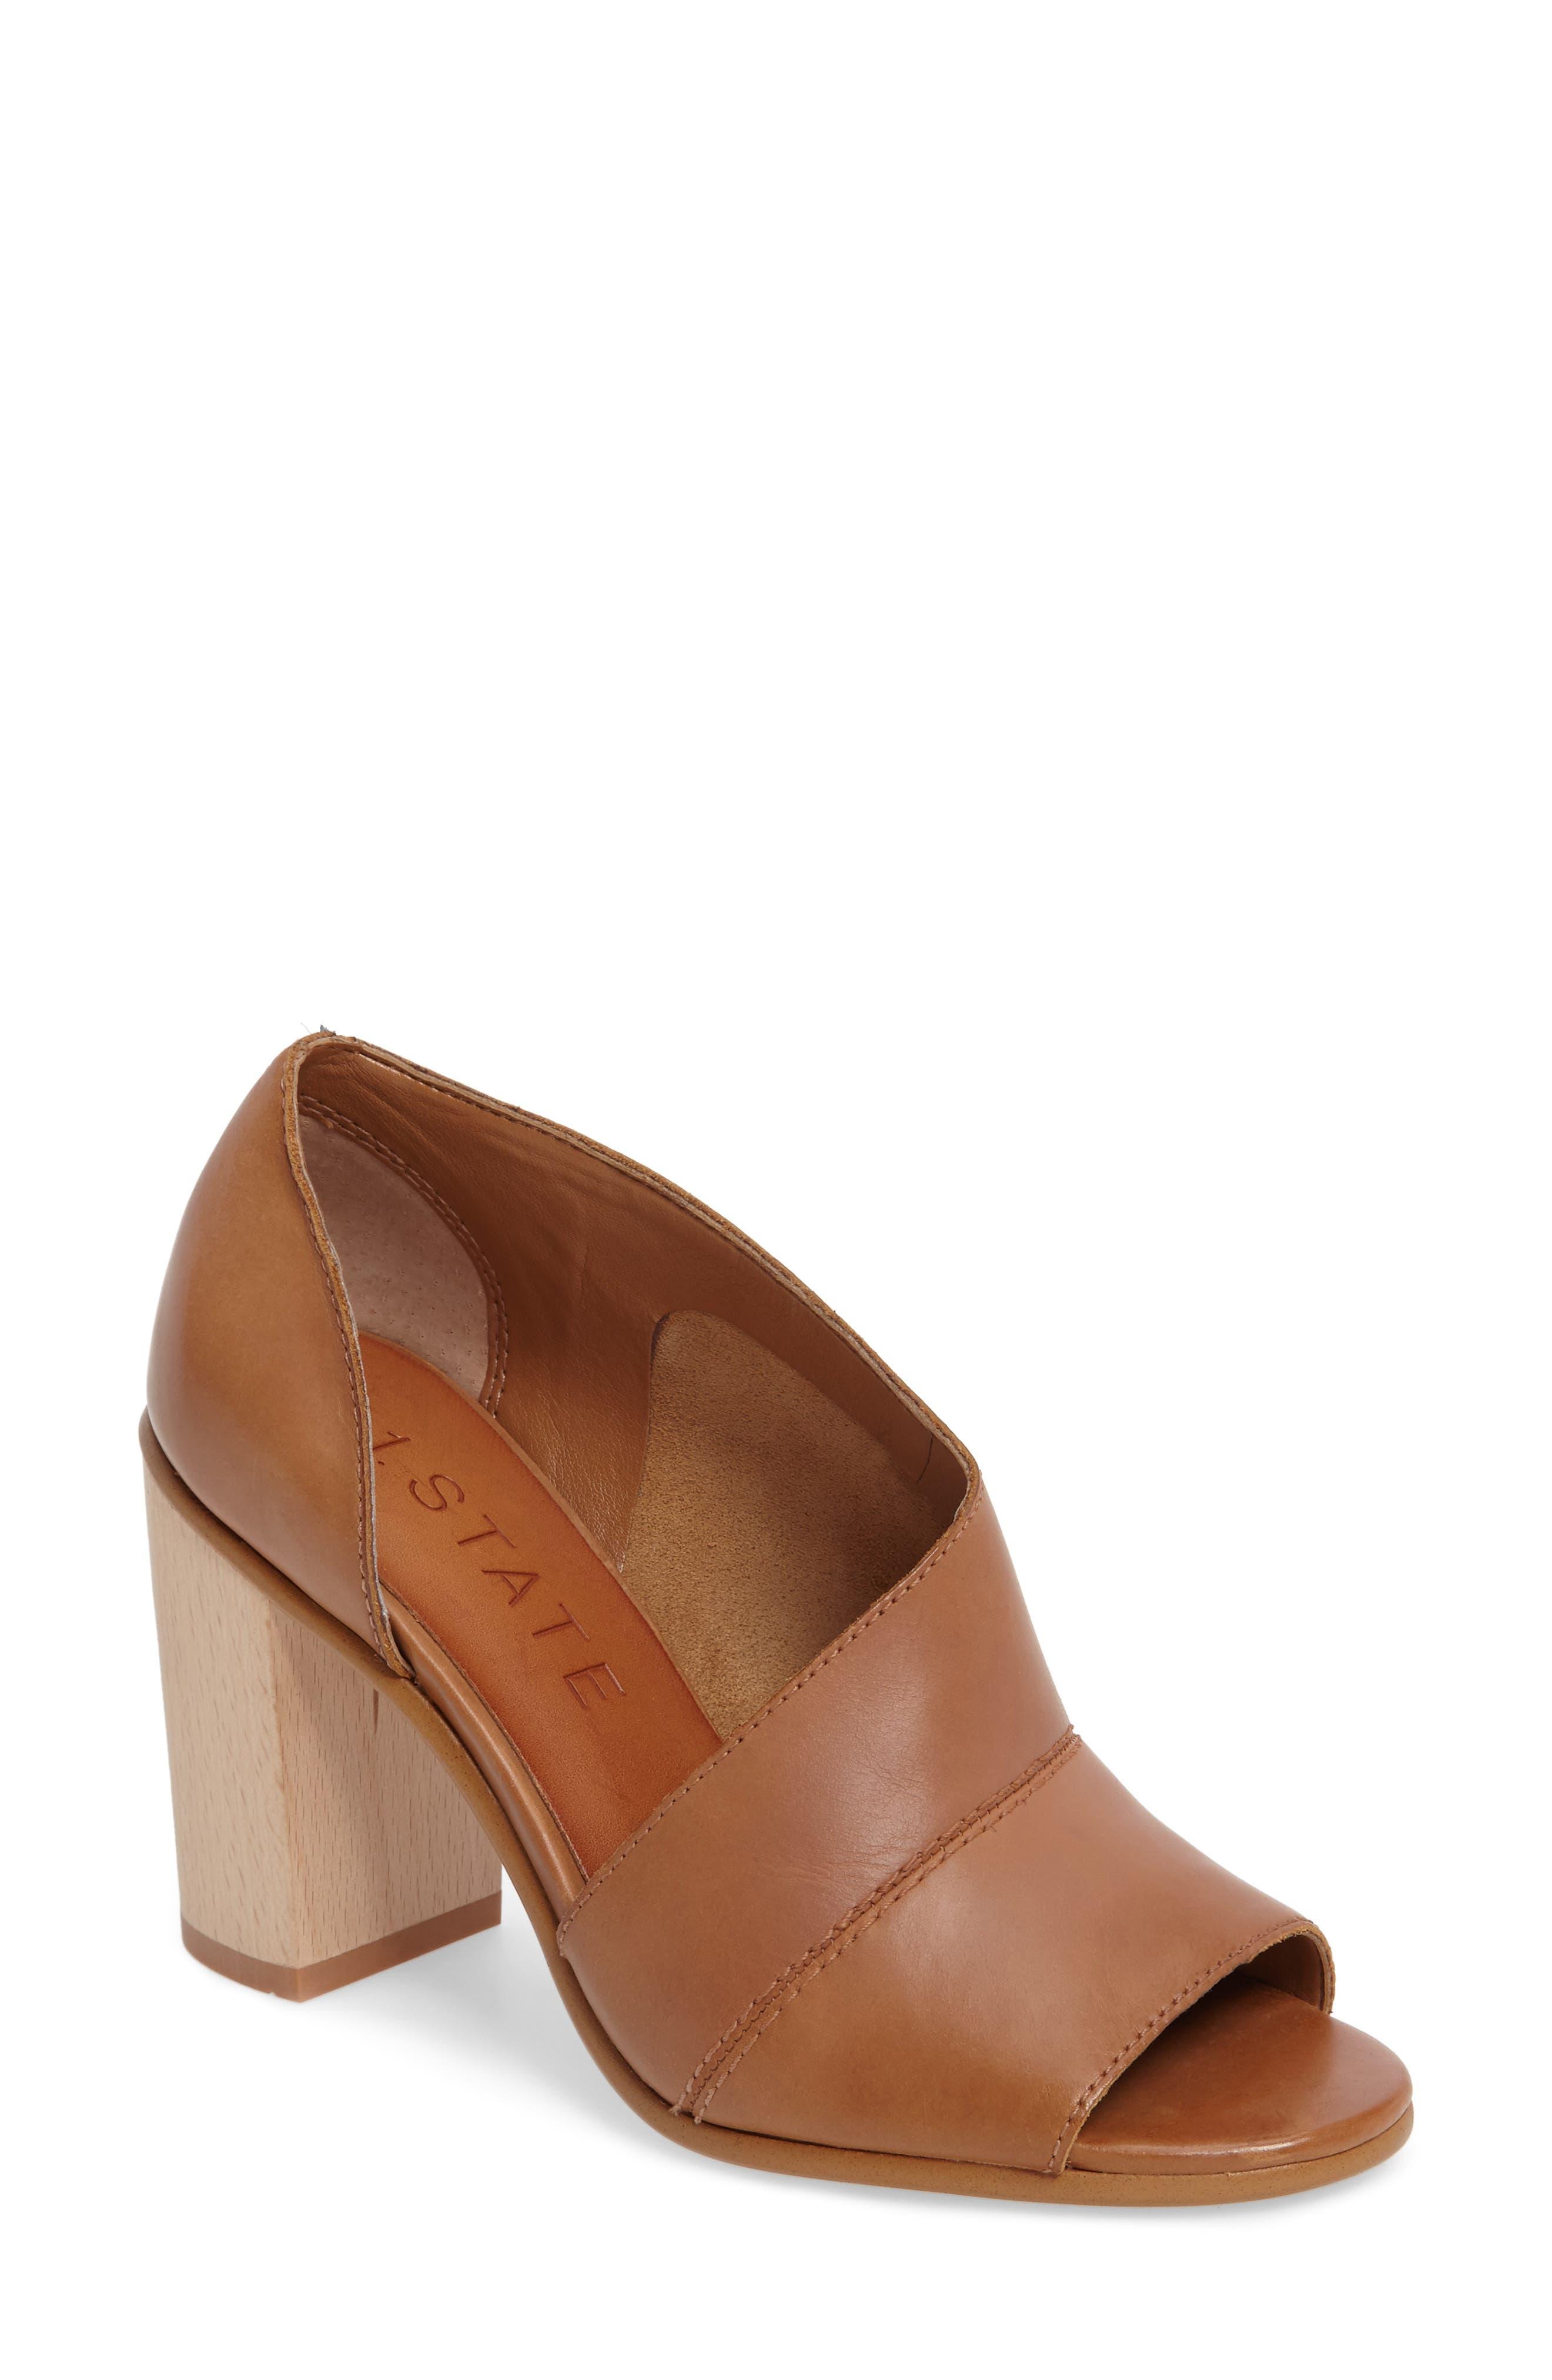 Amble Asymmetrical Sandal,                             Main thumbnail 1, color,                             Tan Leather